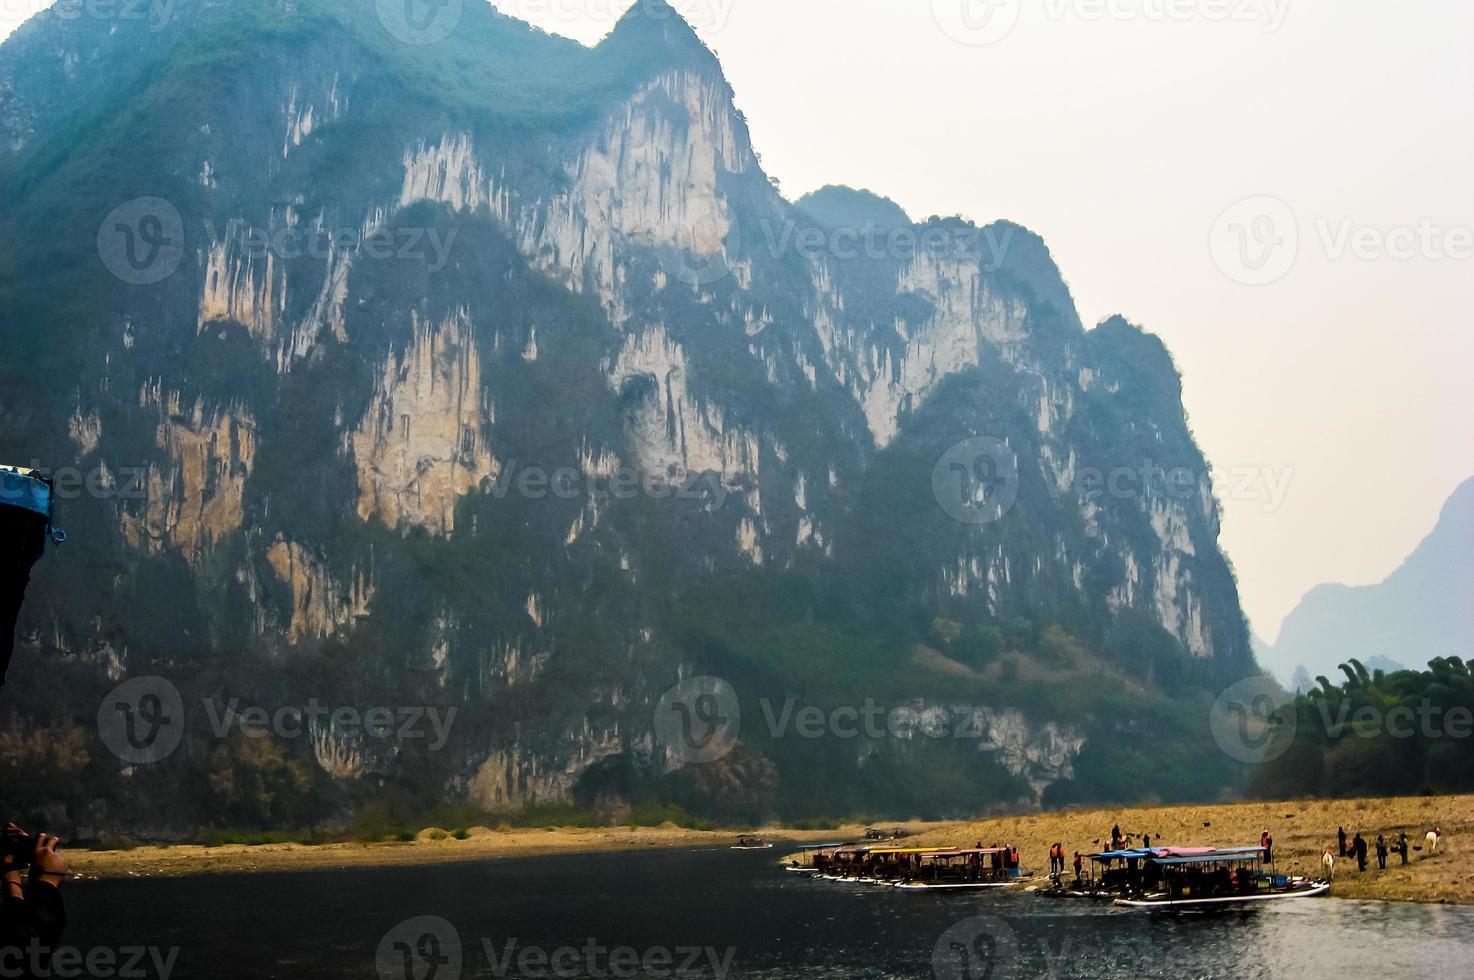 The Mountain of Nine Horses in Guilin, Guangxi China photo